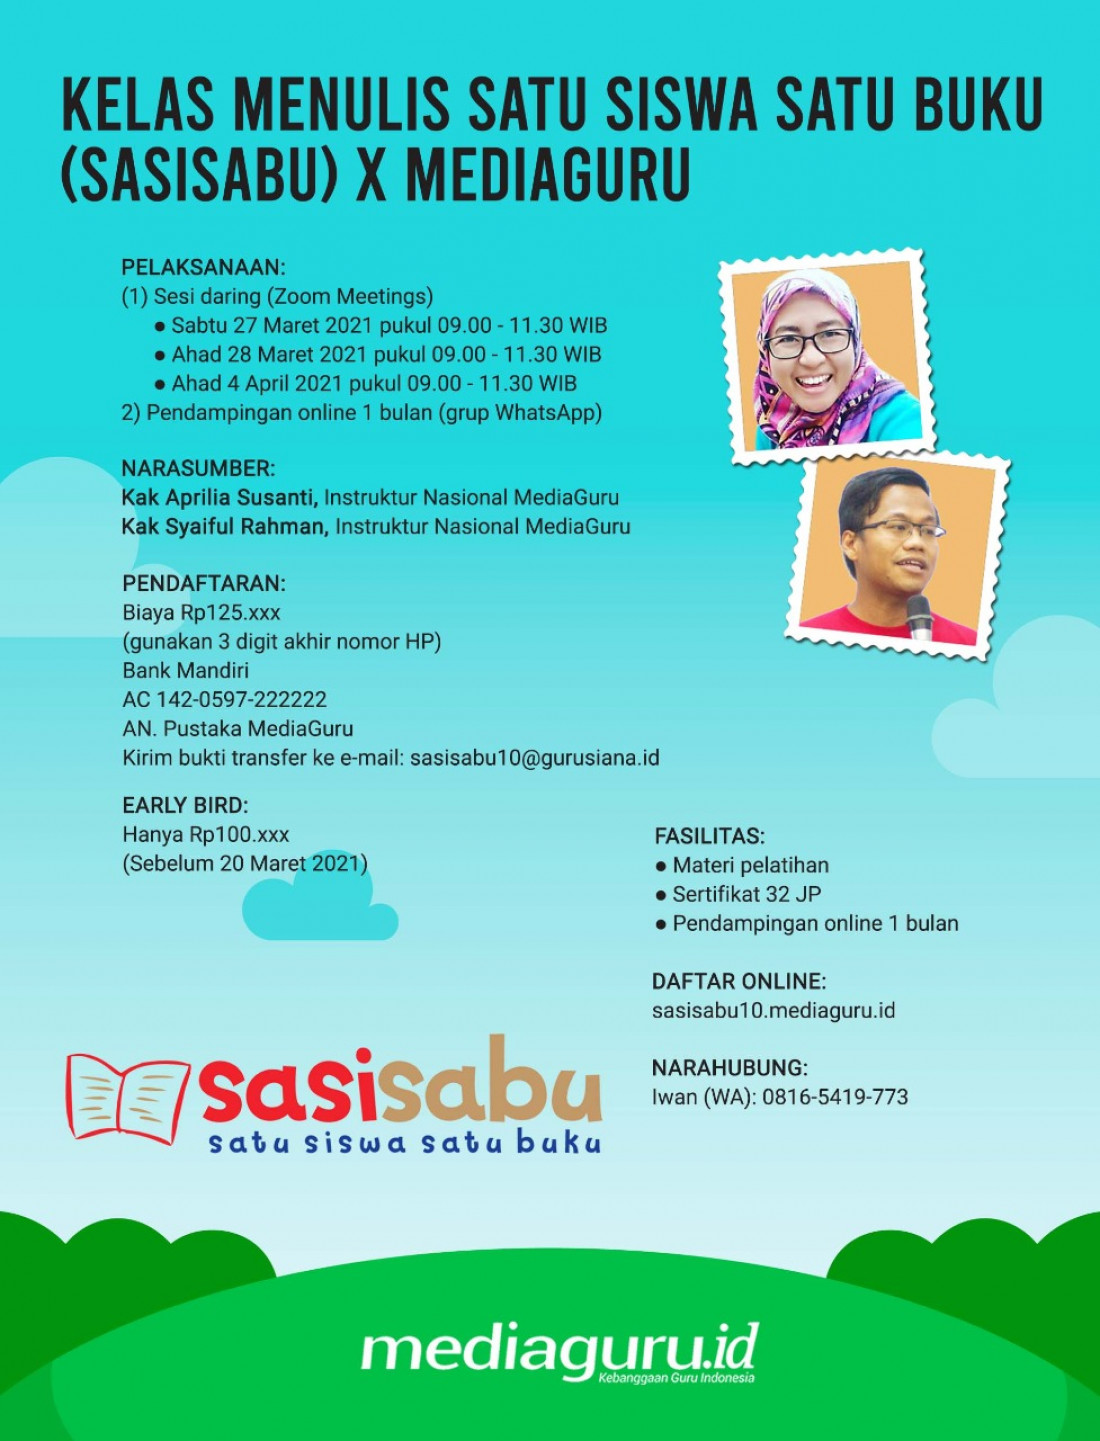 SATU SISWA SATU BUKU (SASISABU) X MEDIAGURU (27 MARET - 4 APRIL 2021)